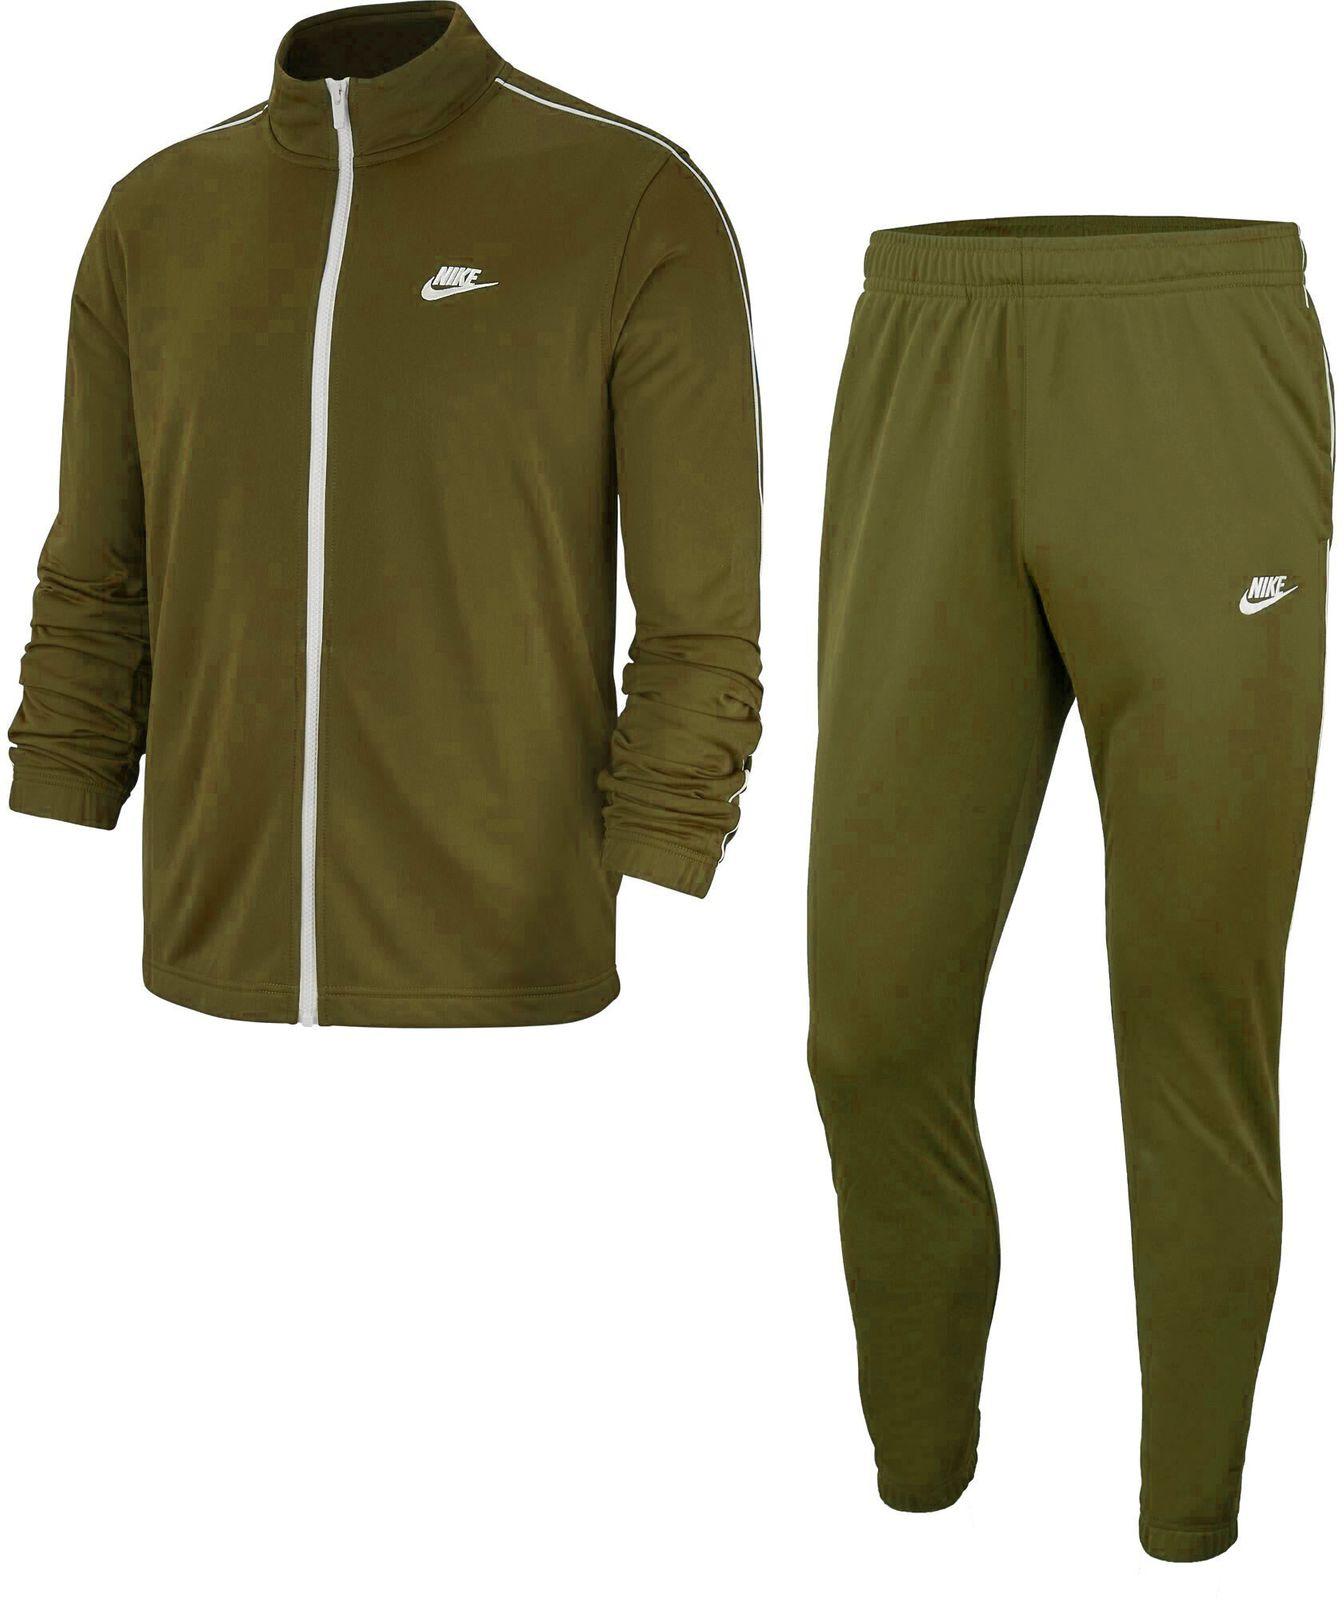 Details zu Nike Herren Fussball Fitness Trainingsanzug M NSW CE TRK SUIT PK BASIC grün